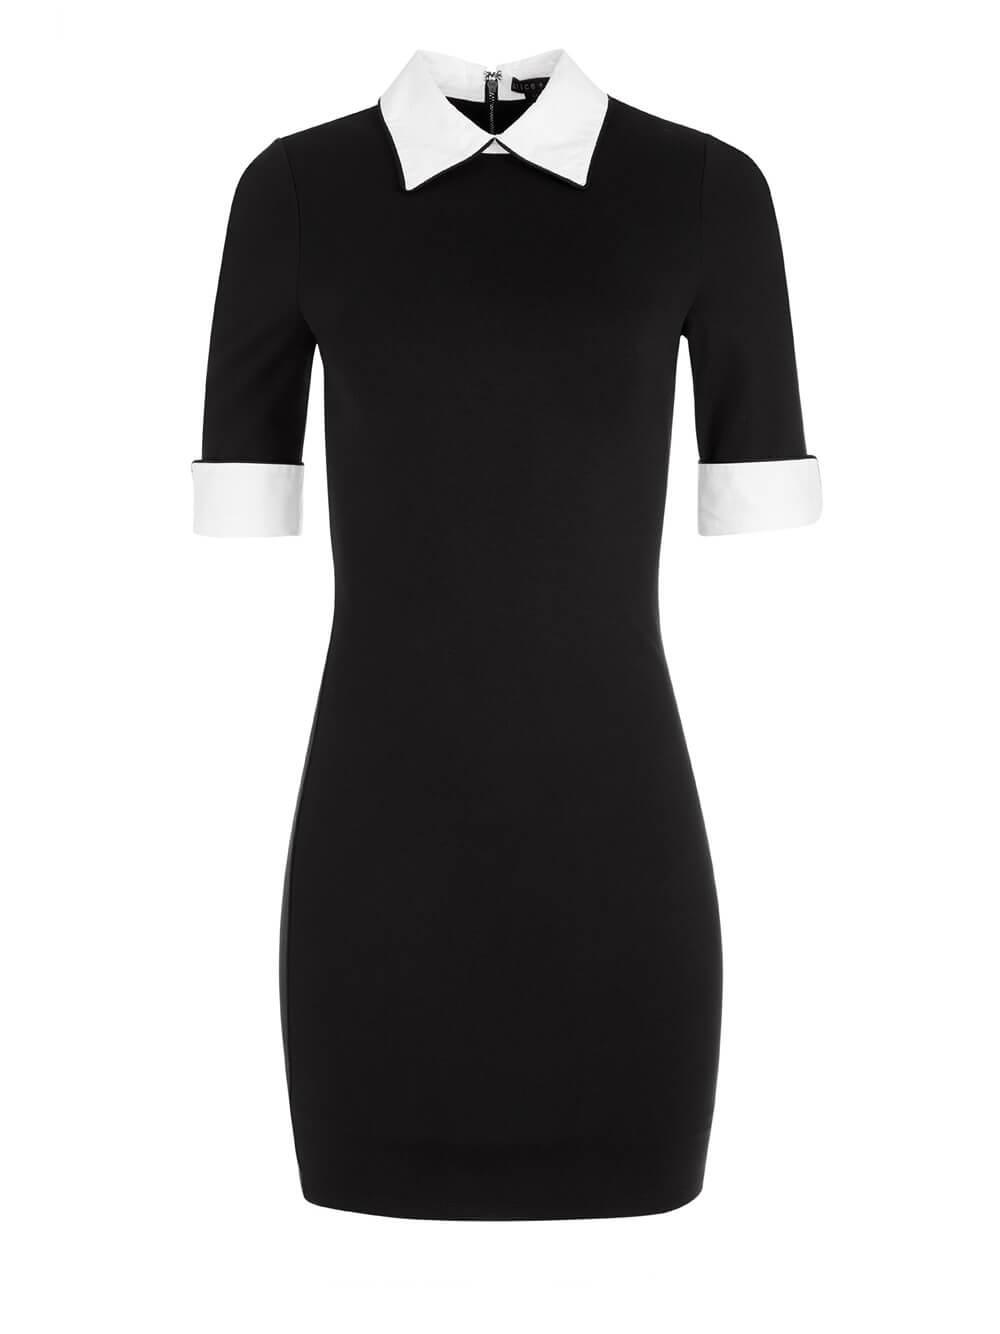 Delora Collared Dress Item # CL000A29507